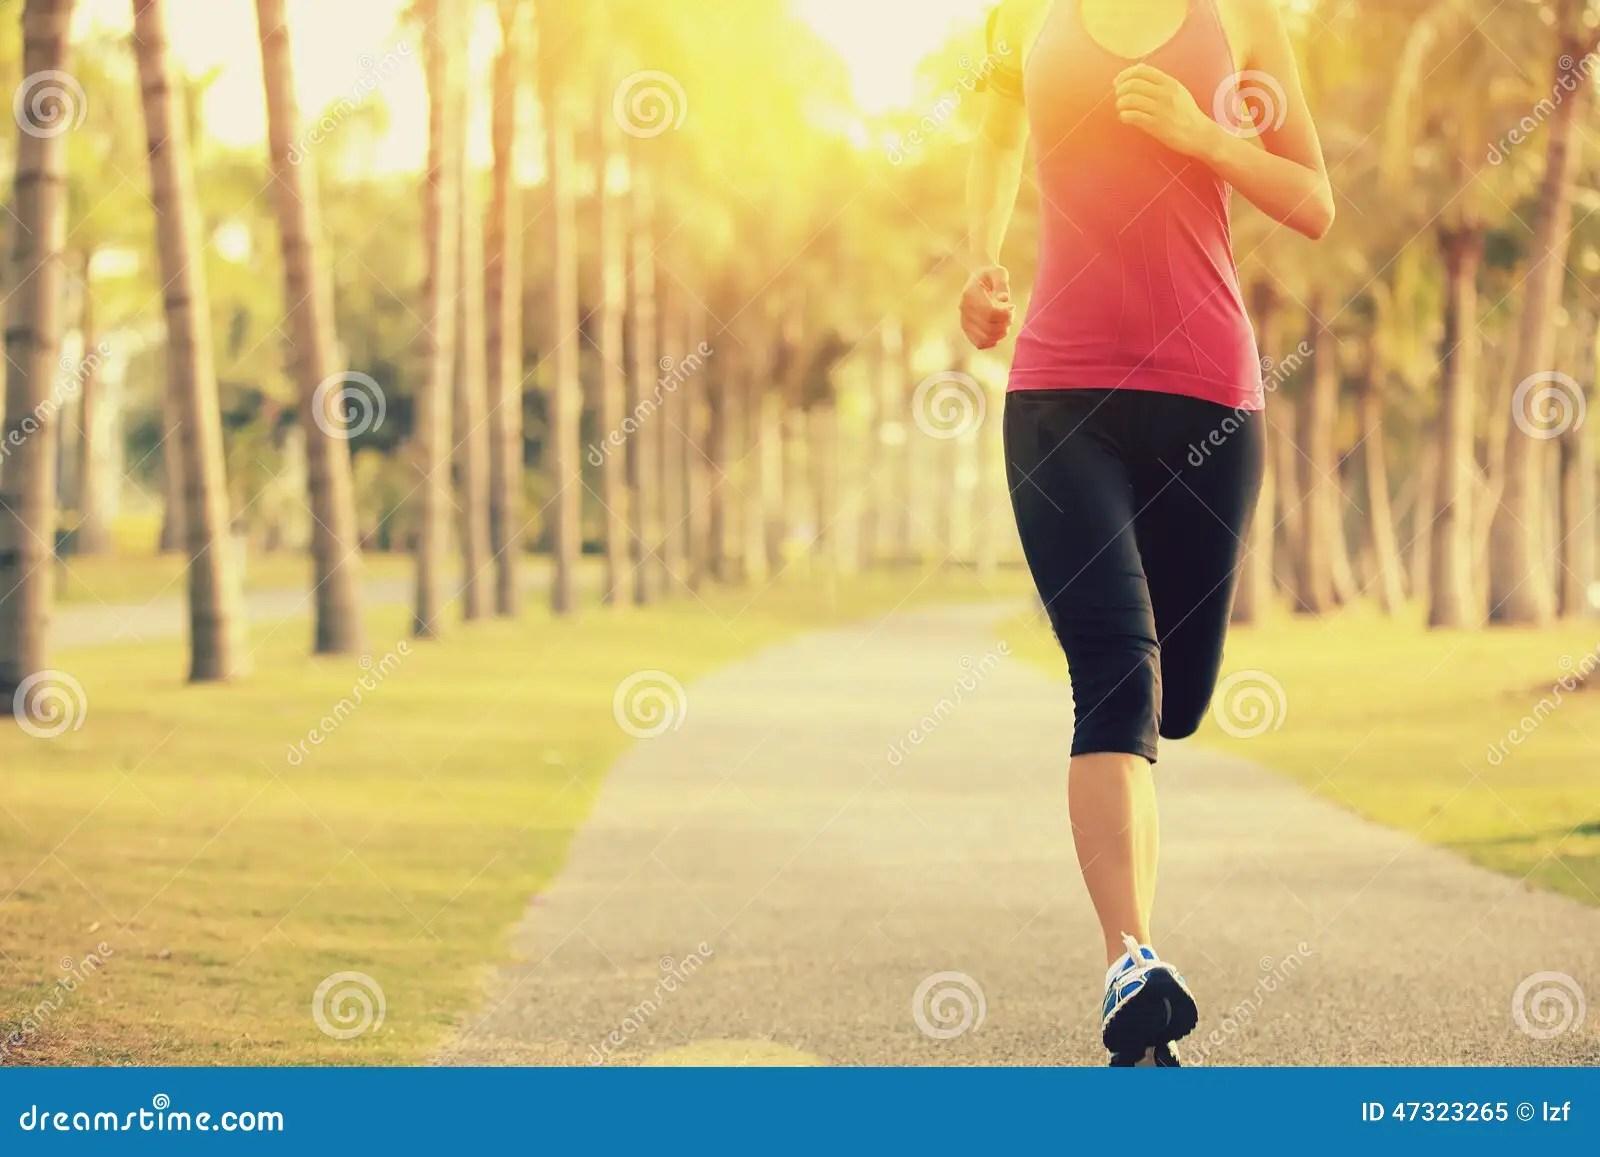 Gym 3d Wallpaper Runner Athlete Running At Tropical Park Woman Fitness